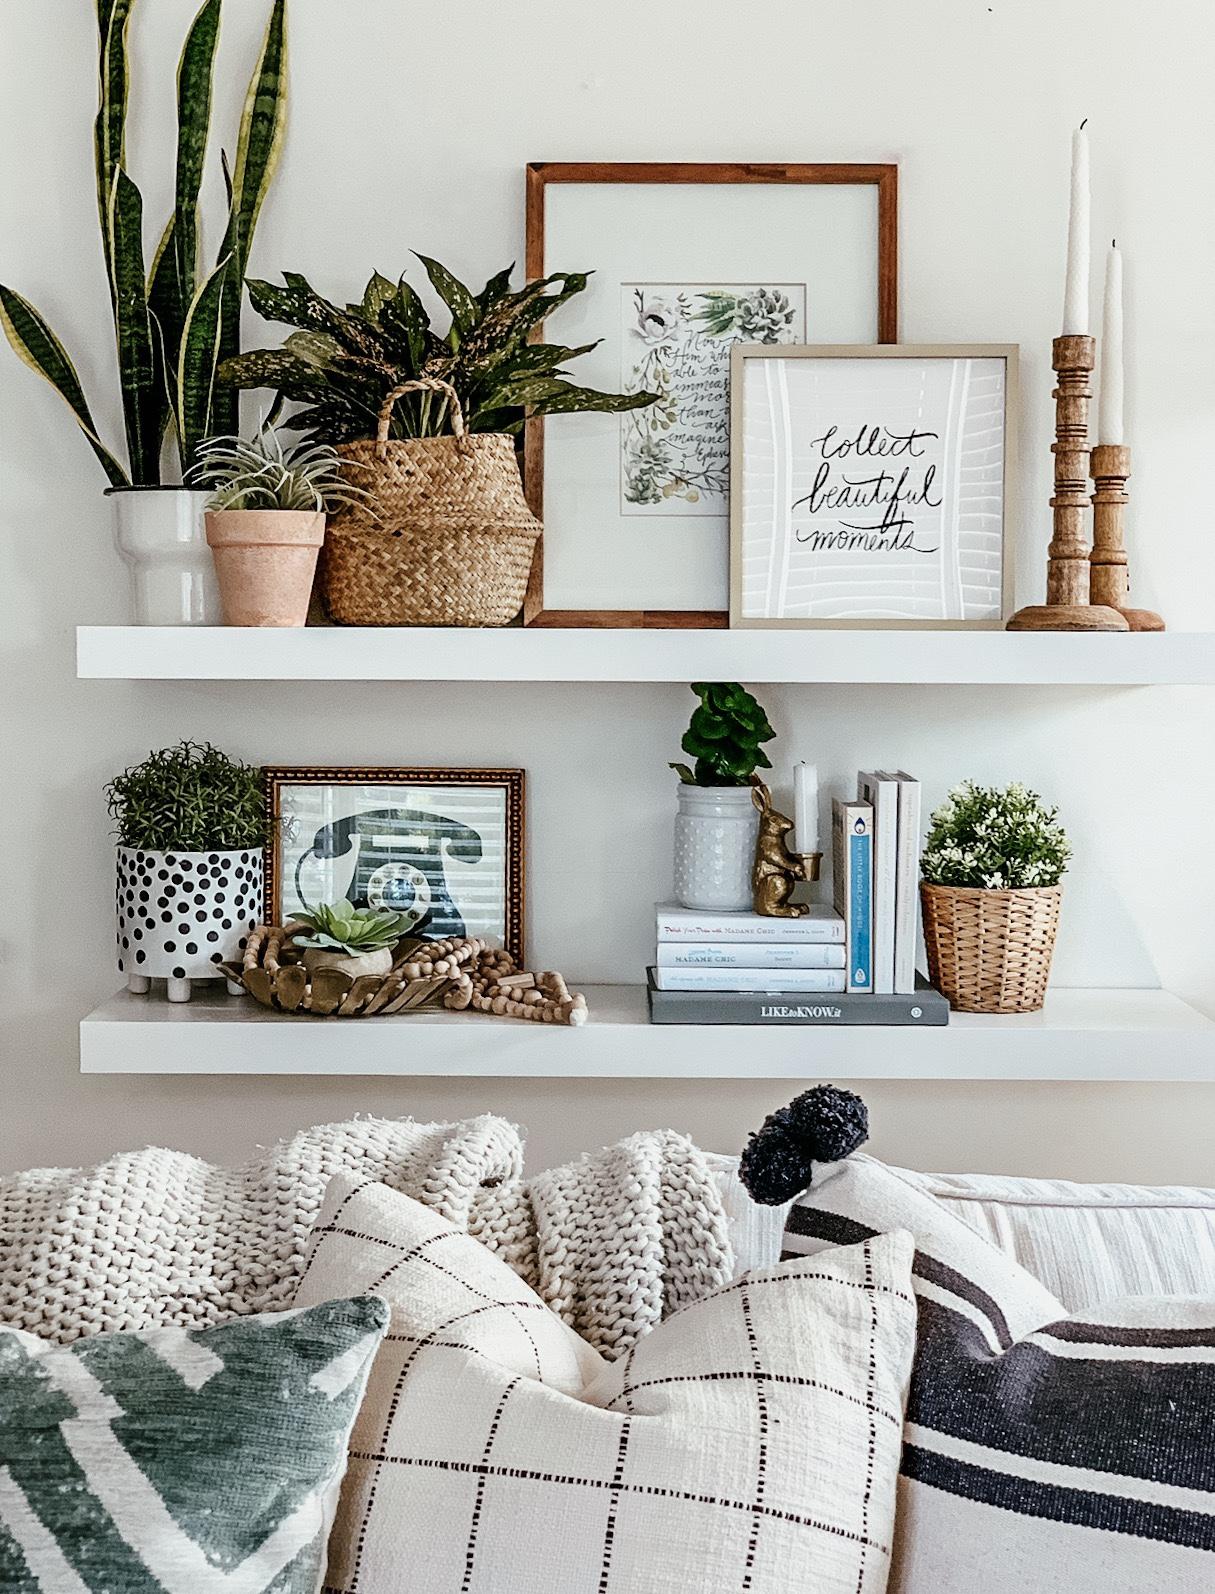 ohmydearblog, the beauty revival living room decor